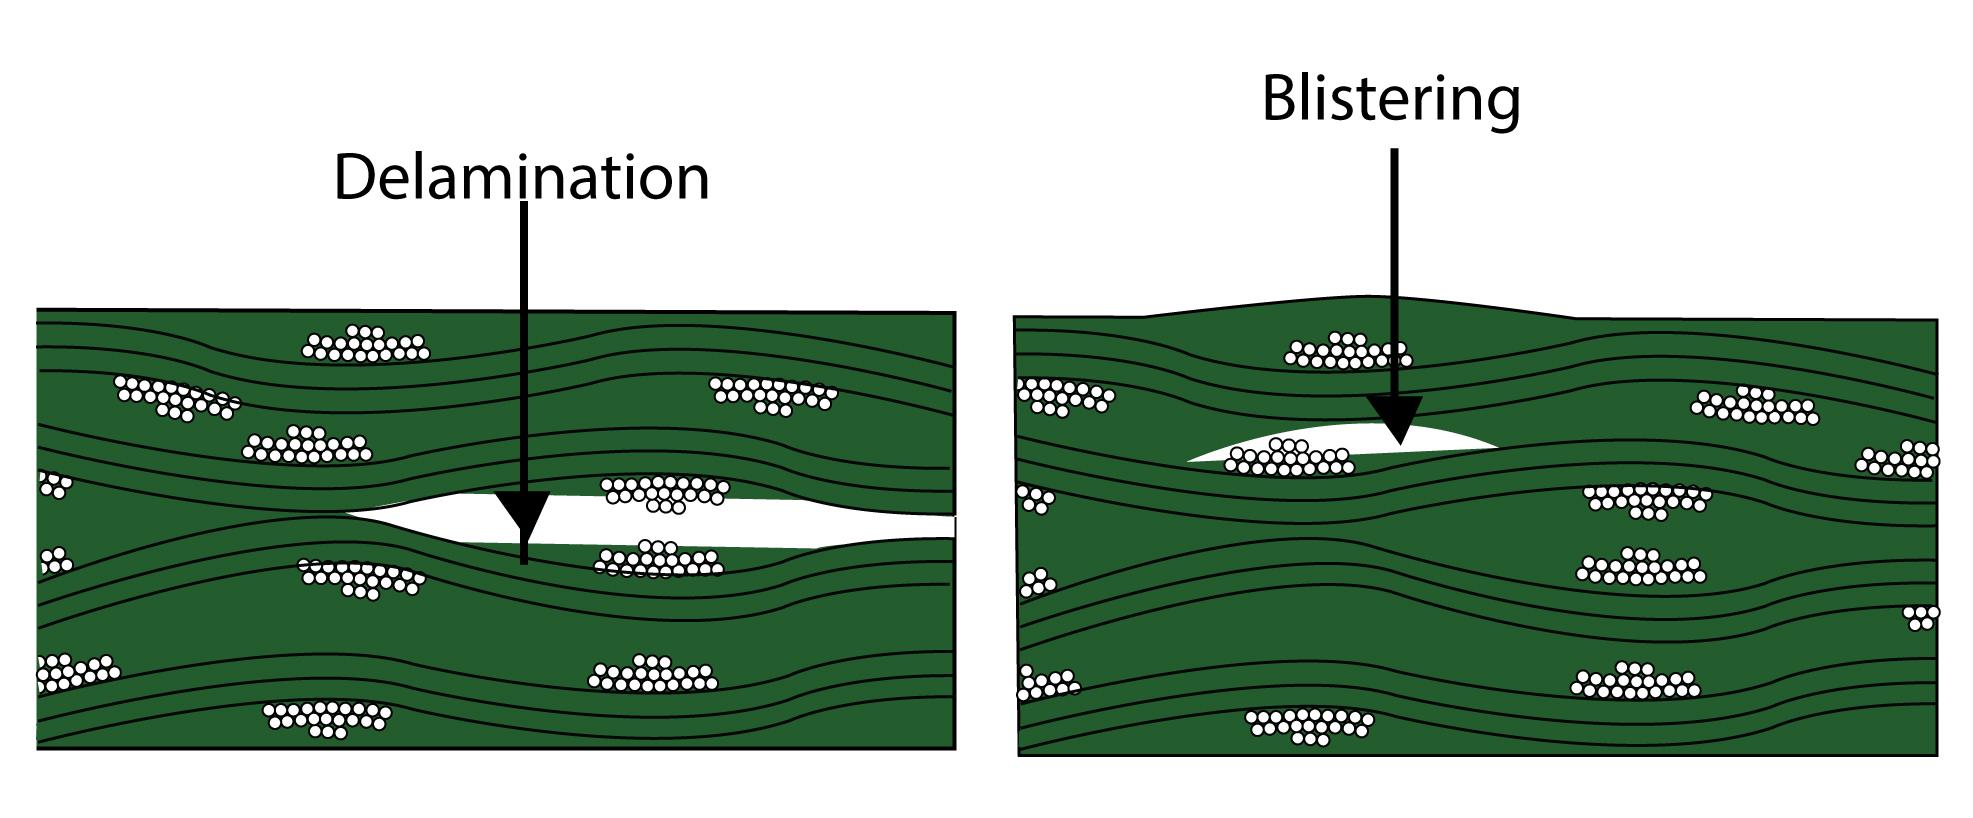 Delamination blistering on PCB materials